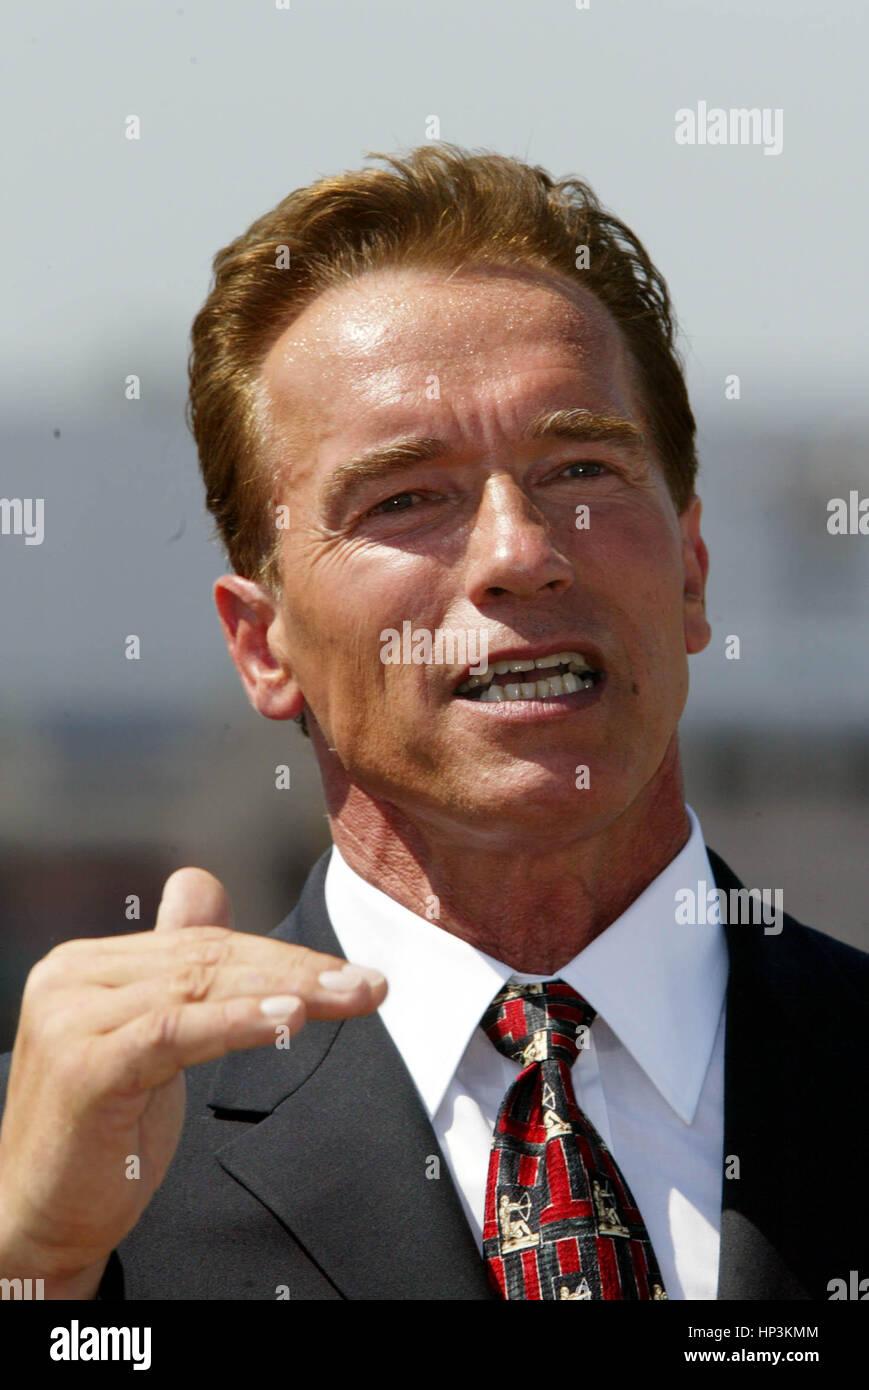 California gubernatorial candidate Arnold Schwarzenegger